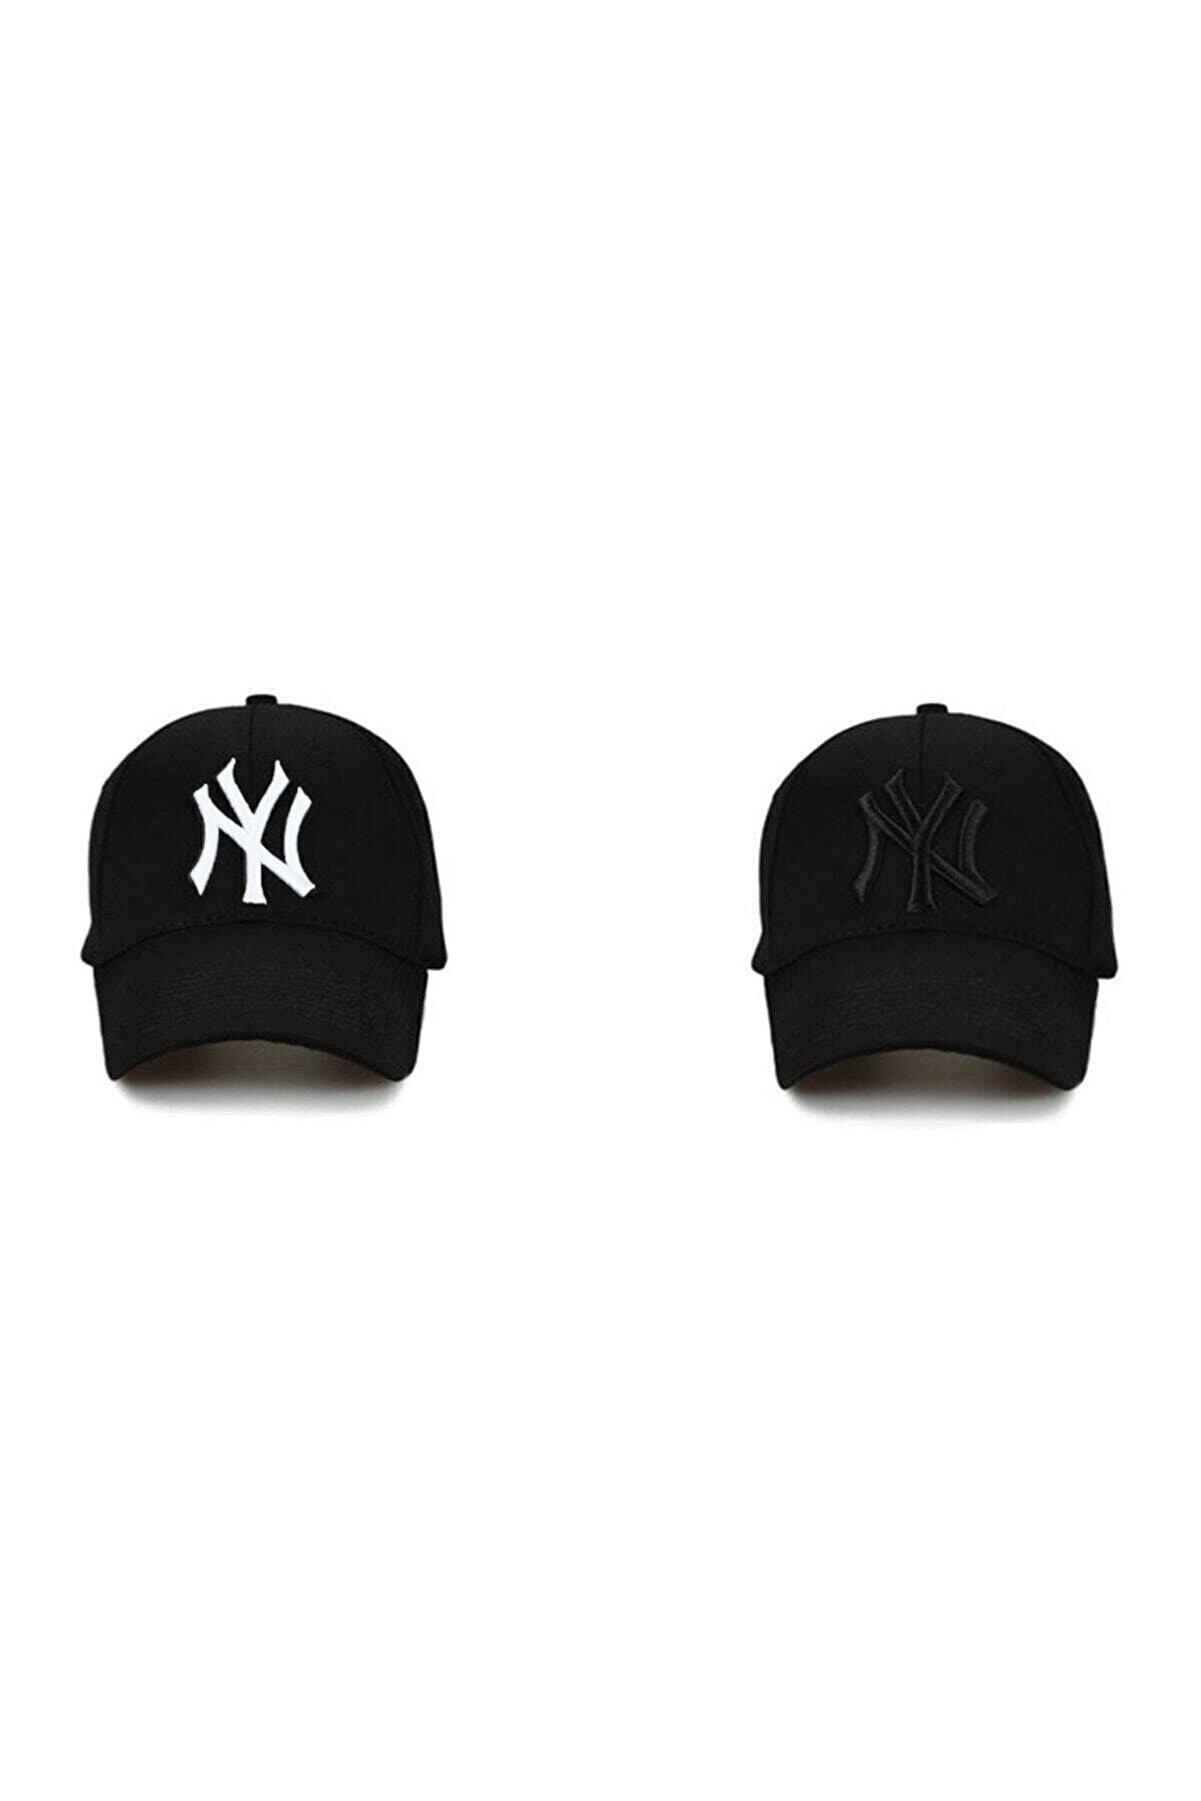 NuxFah Ny New York Şapka Unisex Siyah Şapka 2'li Ikili Set